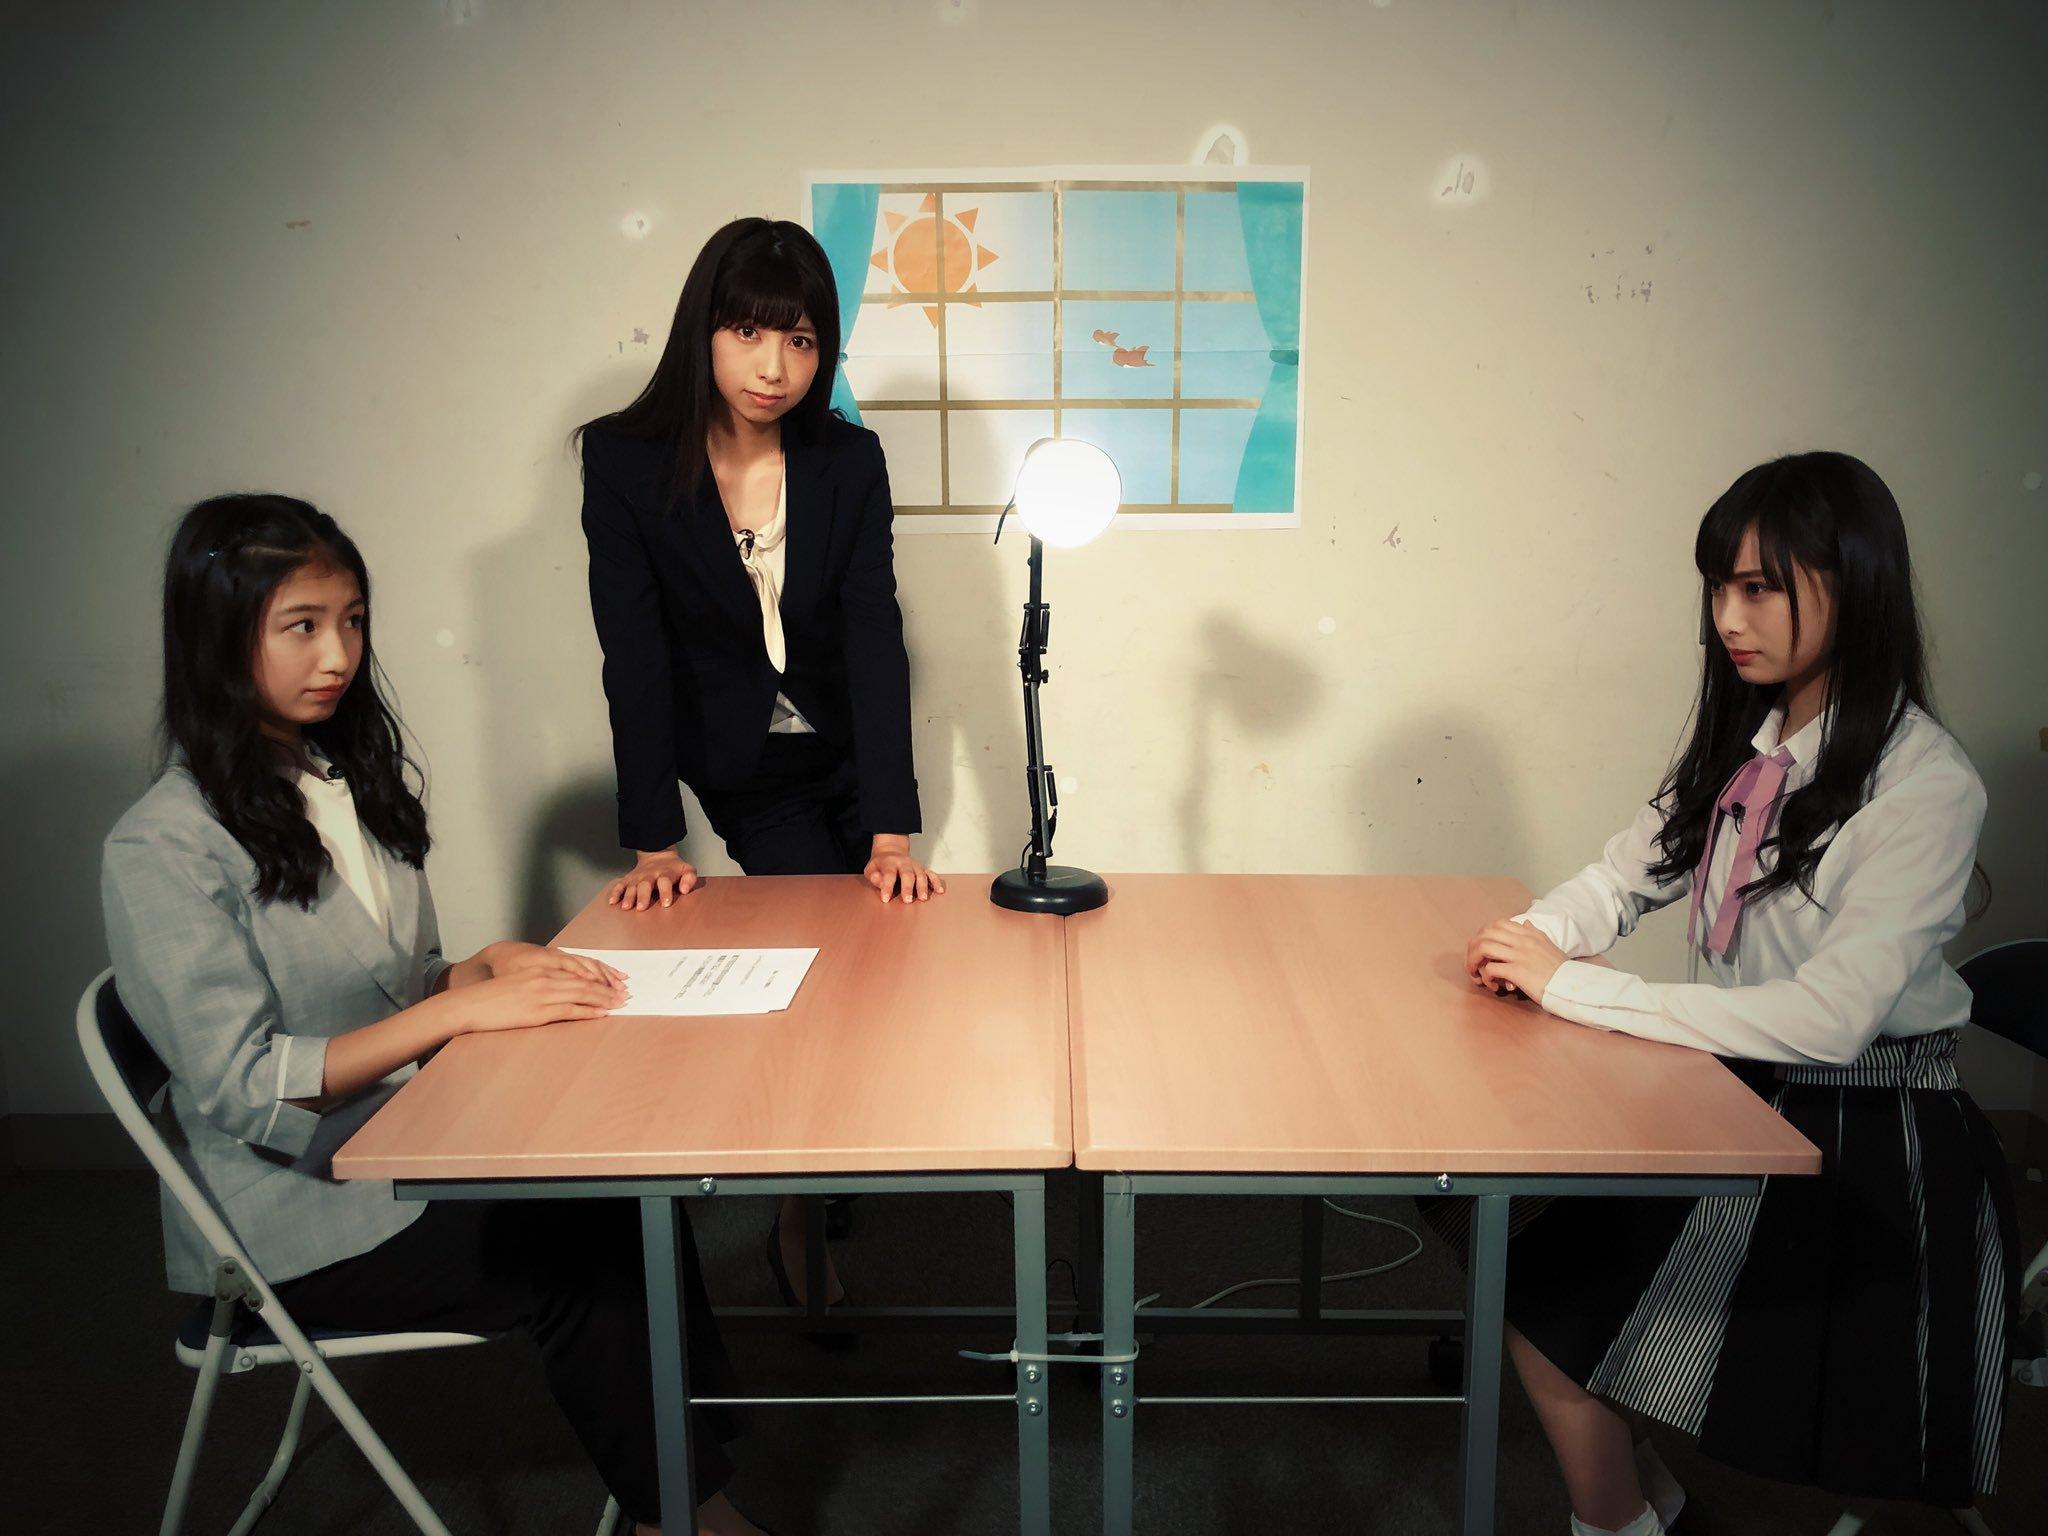 【NMB48】新YNN NMB48 CHANNELで新コーナー「ケイト取調室」。9/24からスタート。